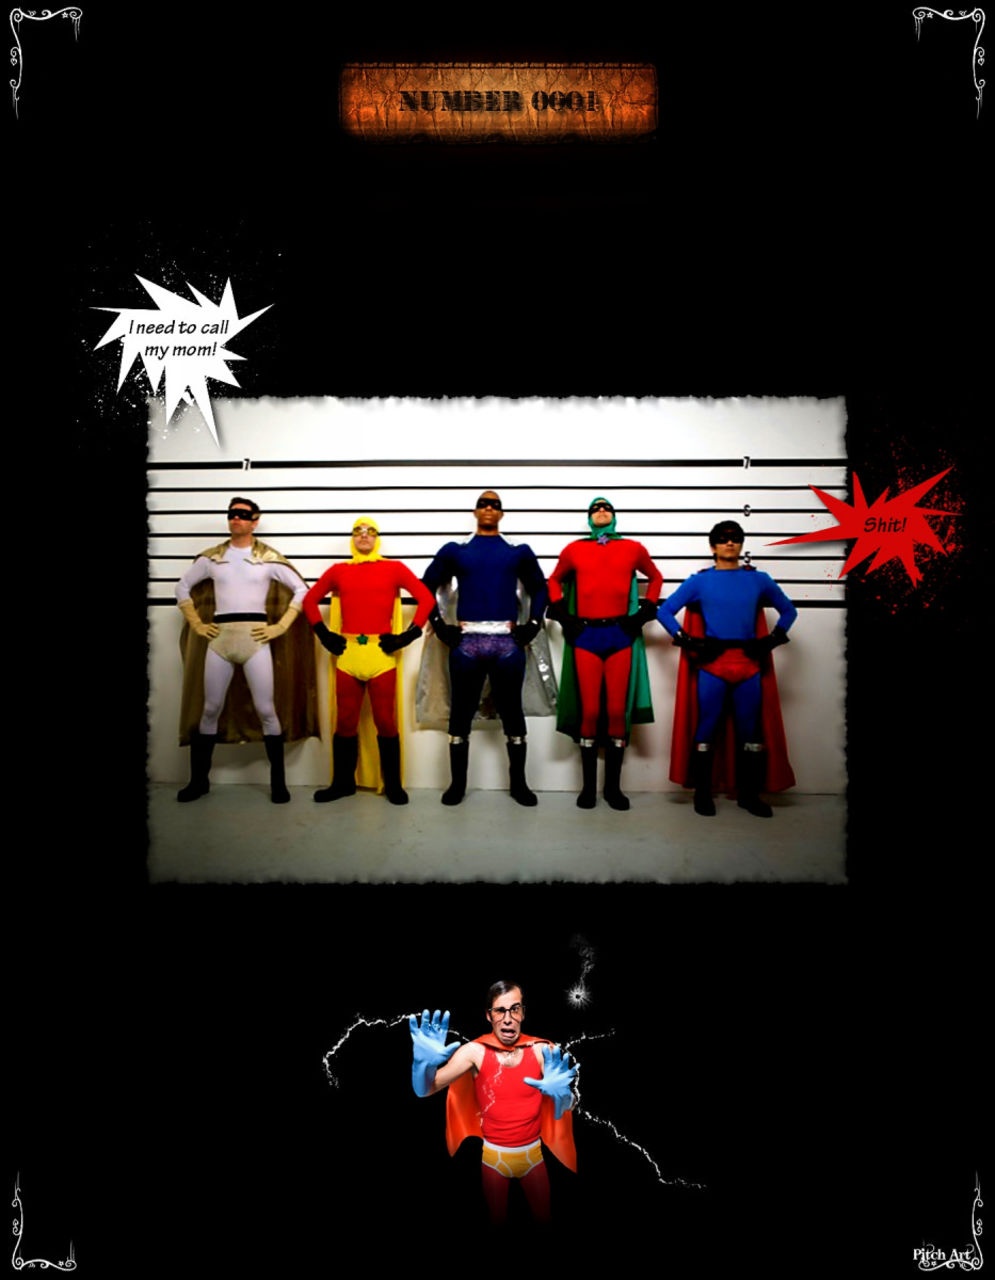 Studio Pitch Art Band Of Heroes